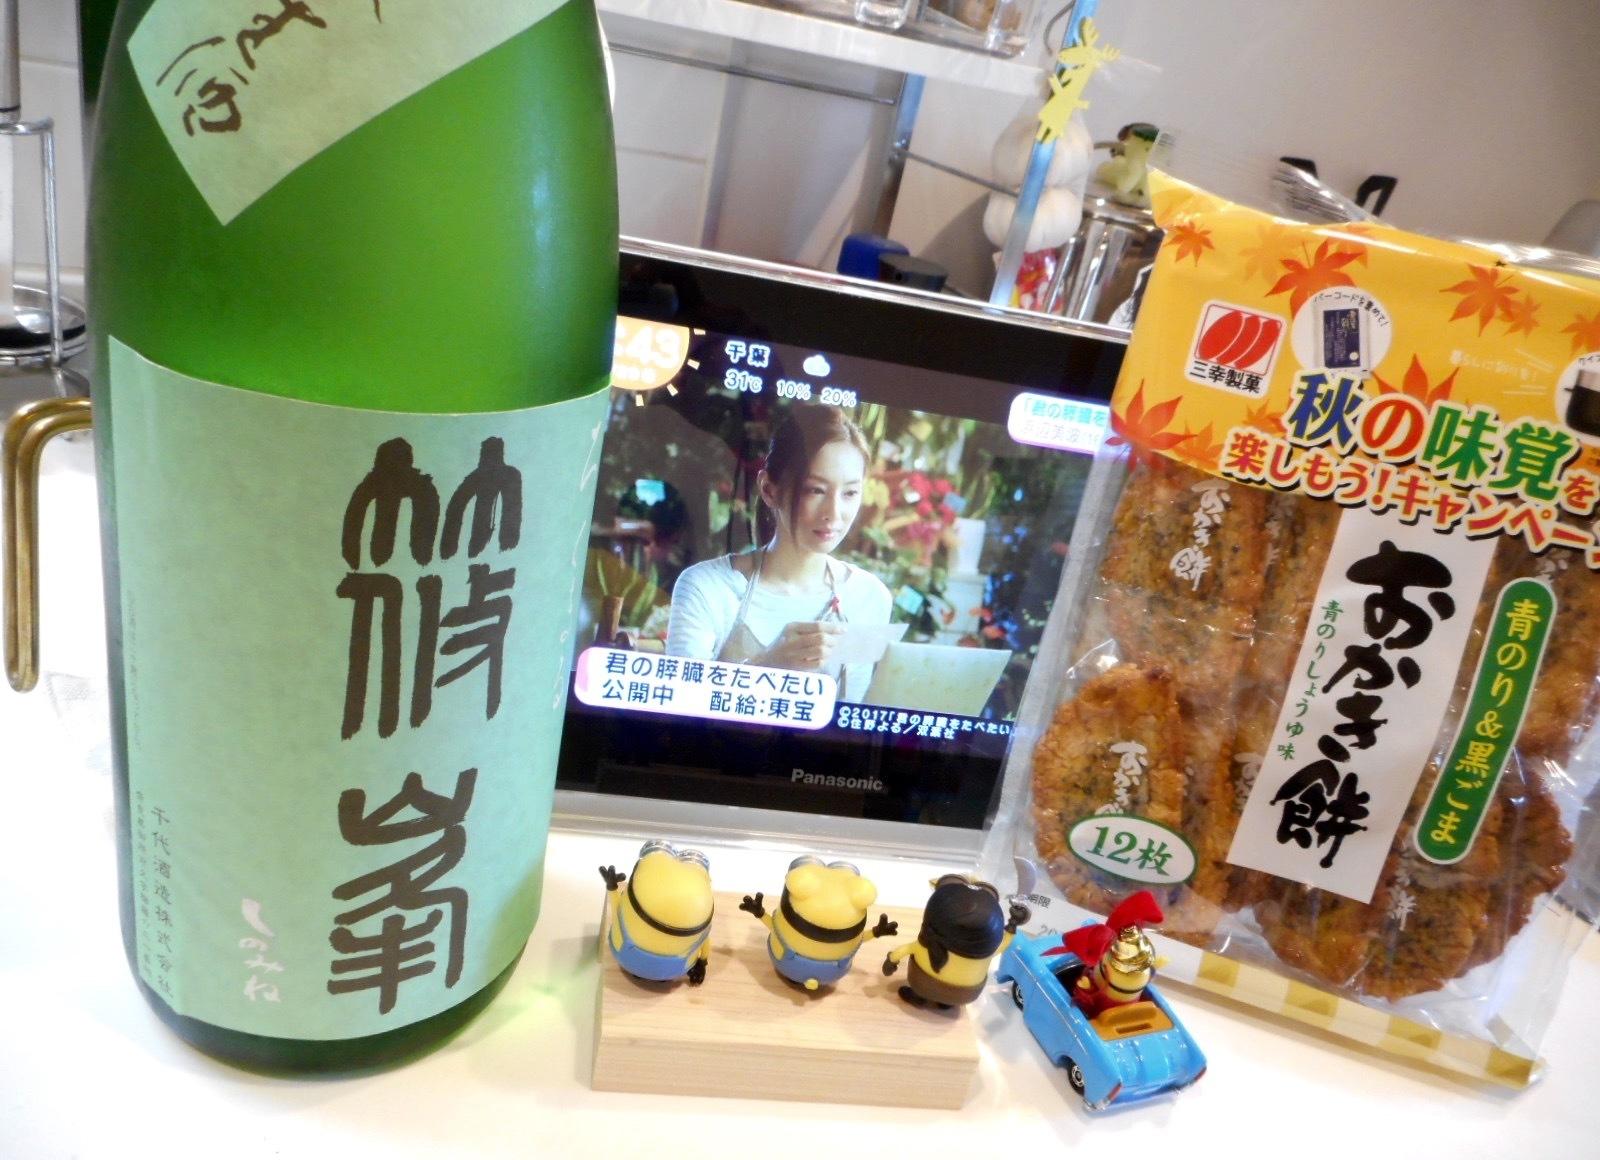 rokumaru_yamada27by2_4.jpg